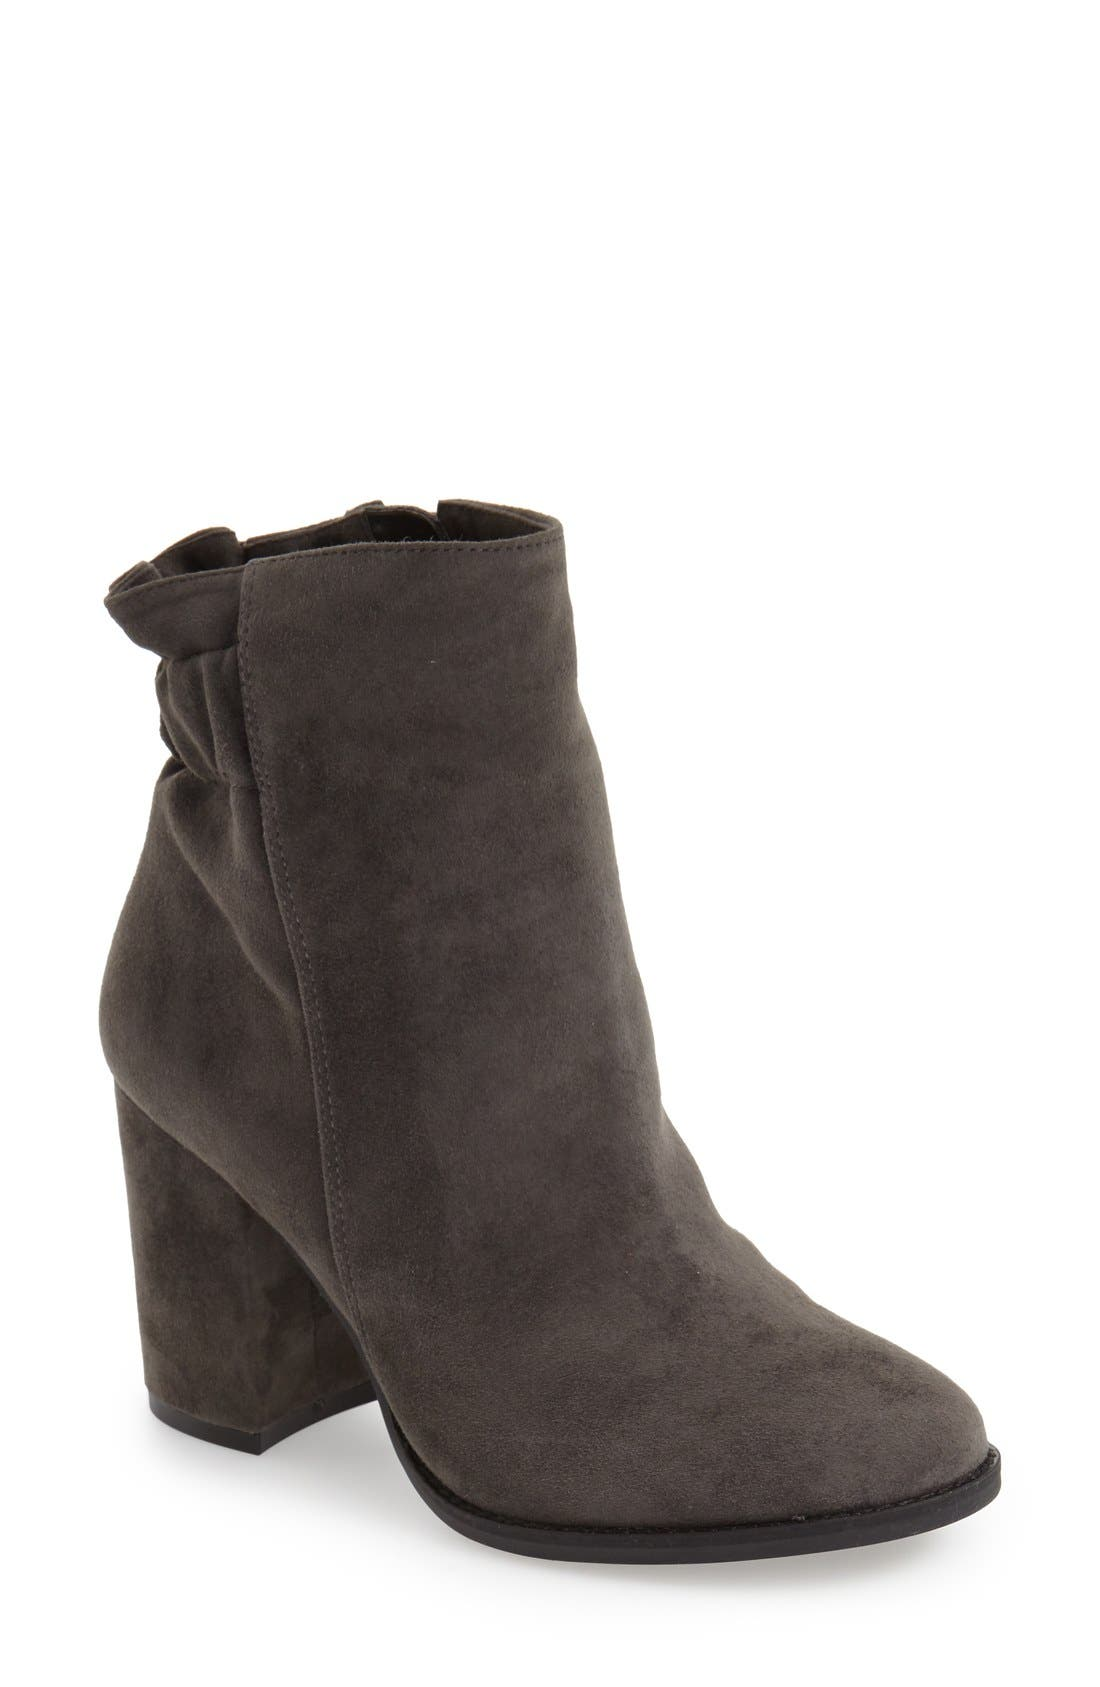 'Rakel' Gathered Heel Zip Bootie,                         Main,                         color, Lavagna Grey Suede